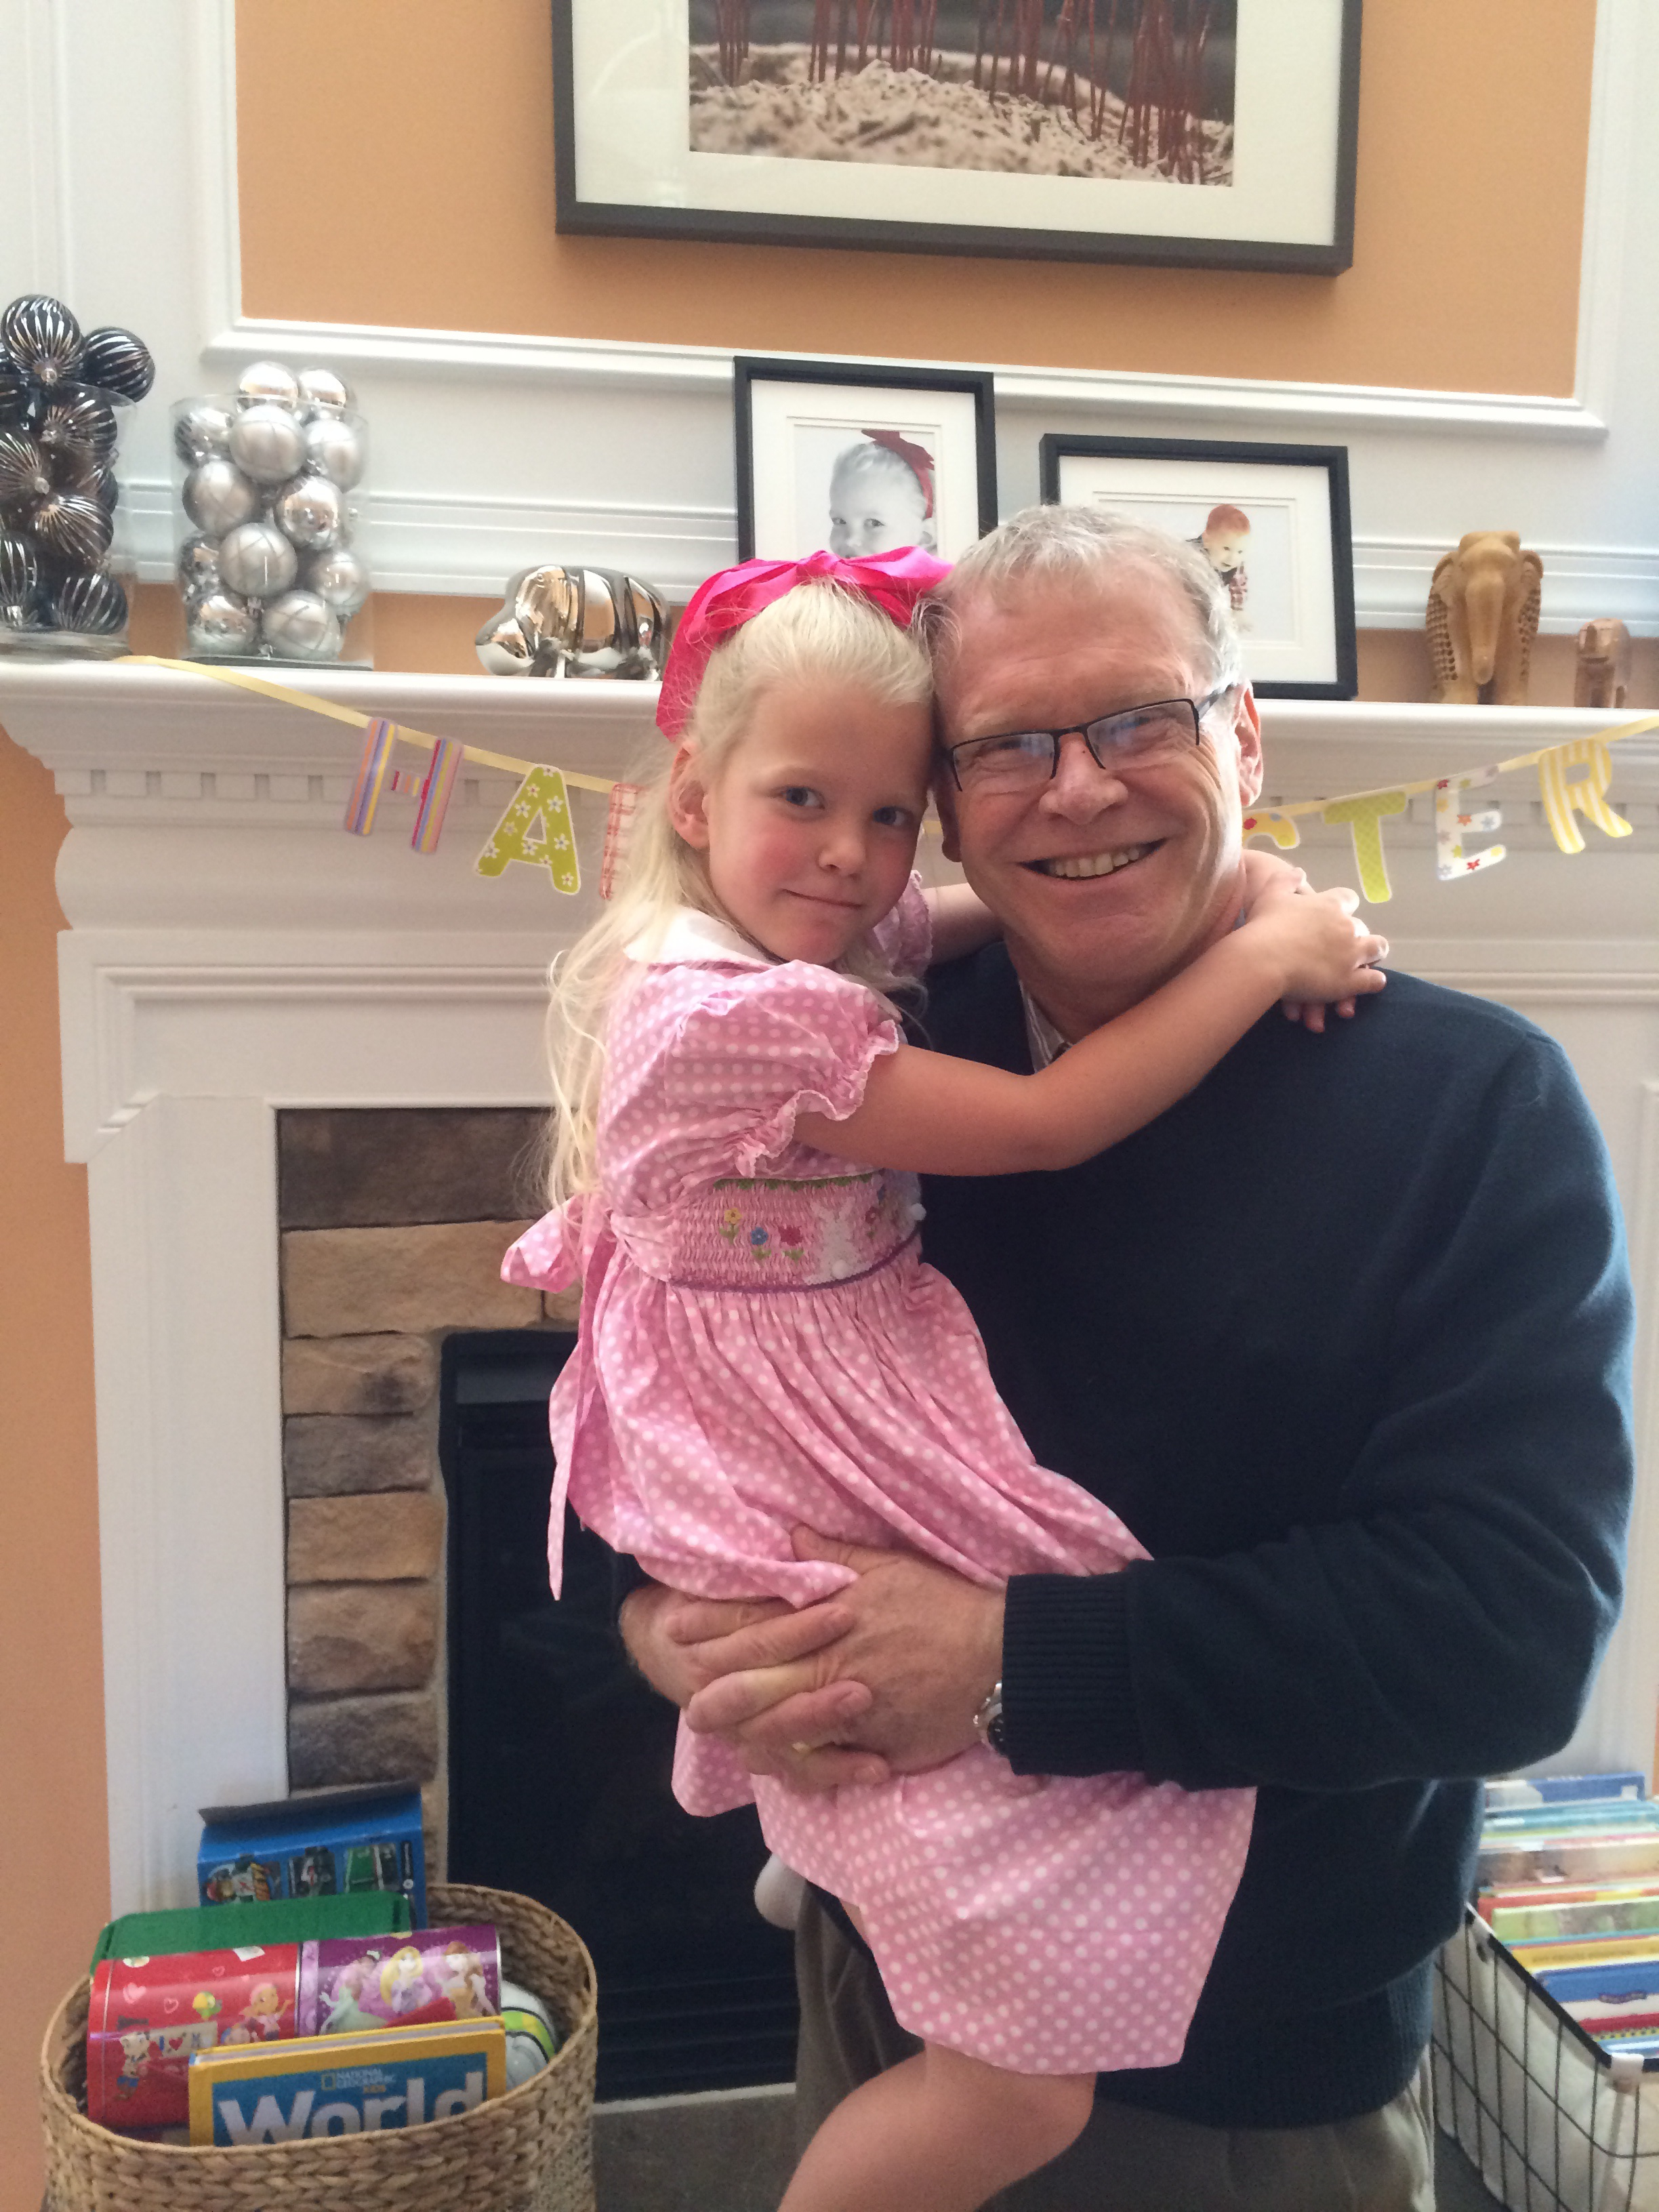 Paul and our precious Ava!